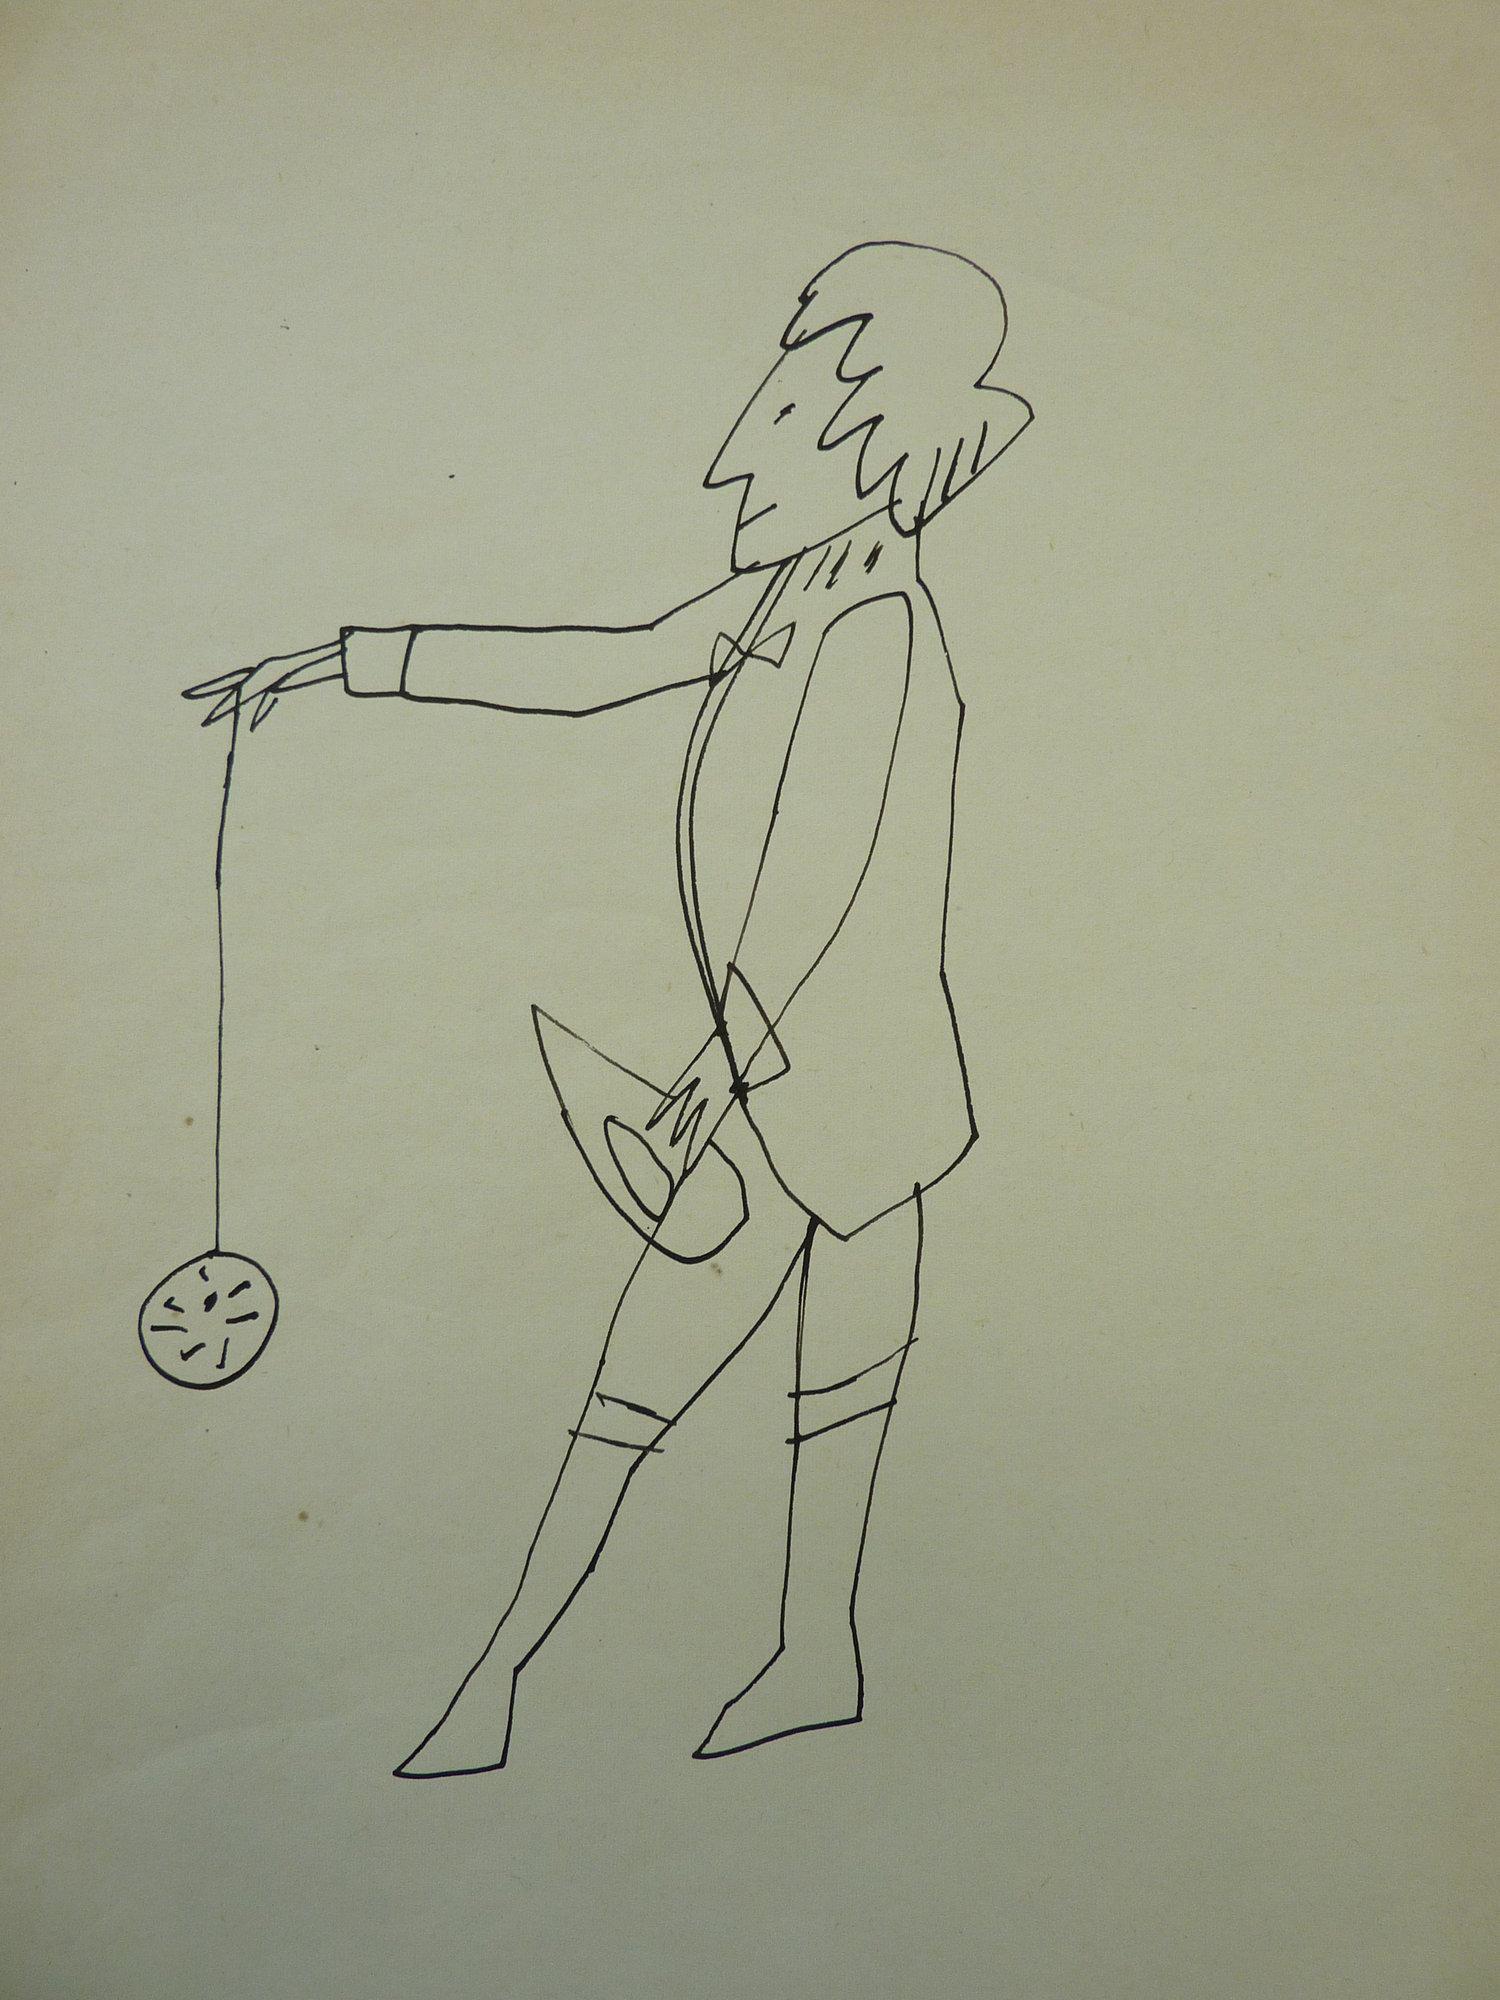 Andy Warhol - Standing Man With Yo-Yo - Additional Information